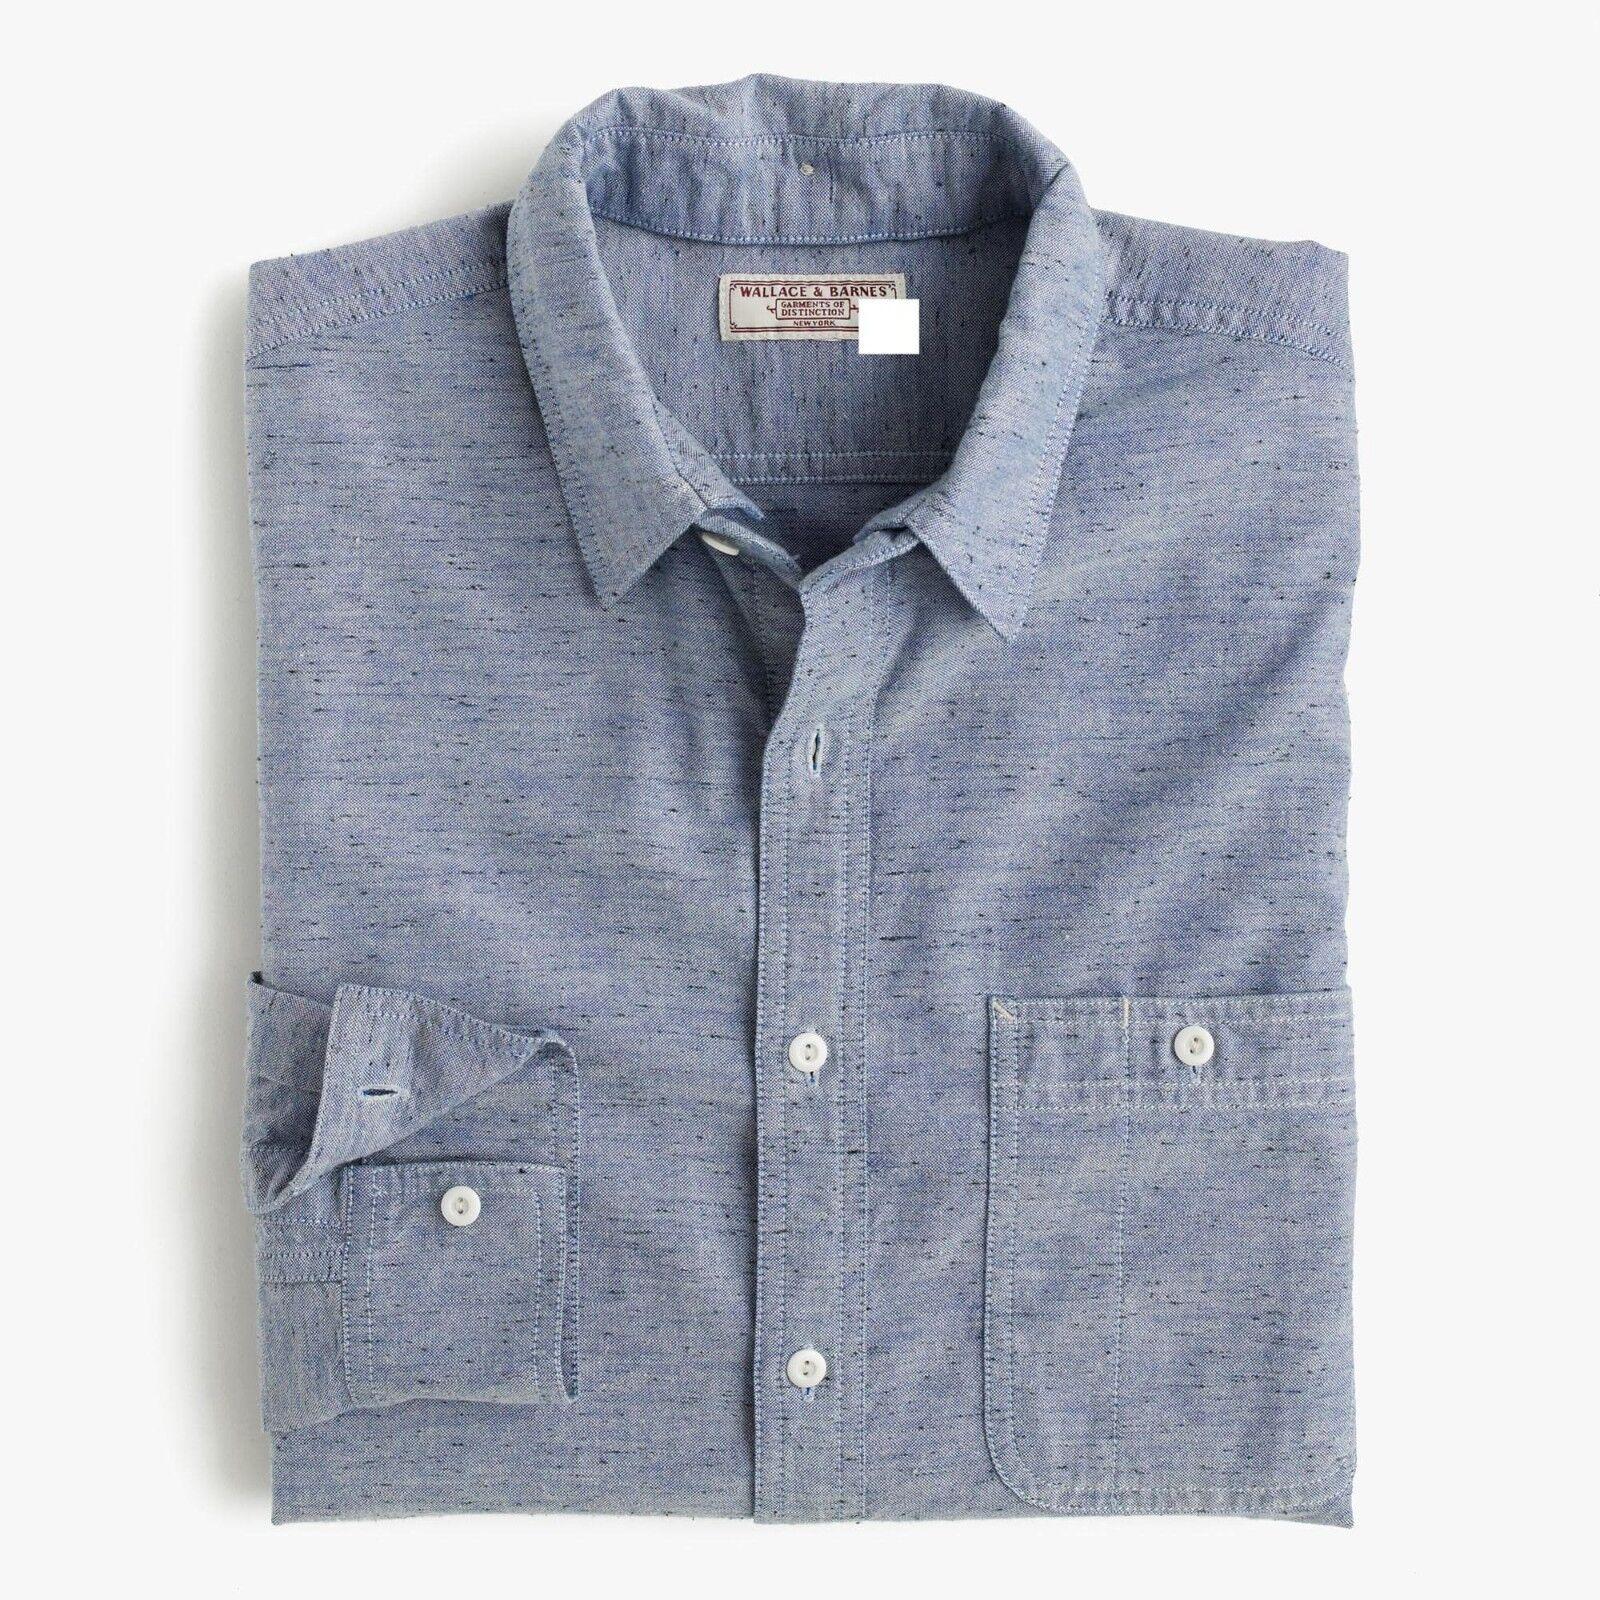 Wallace & Barnes removable-collar indigo oxford shirt, Vintage inspired RRP